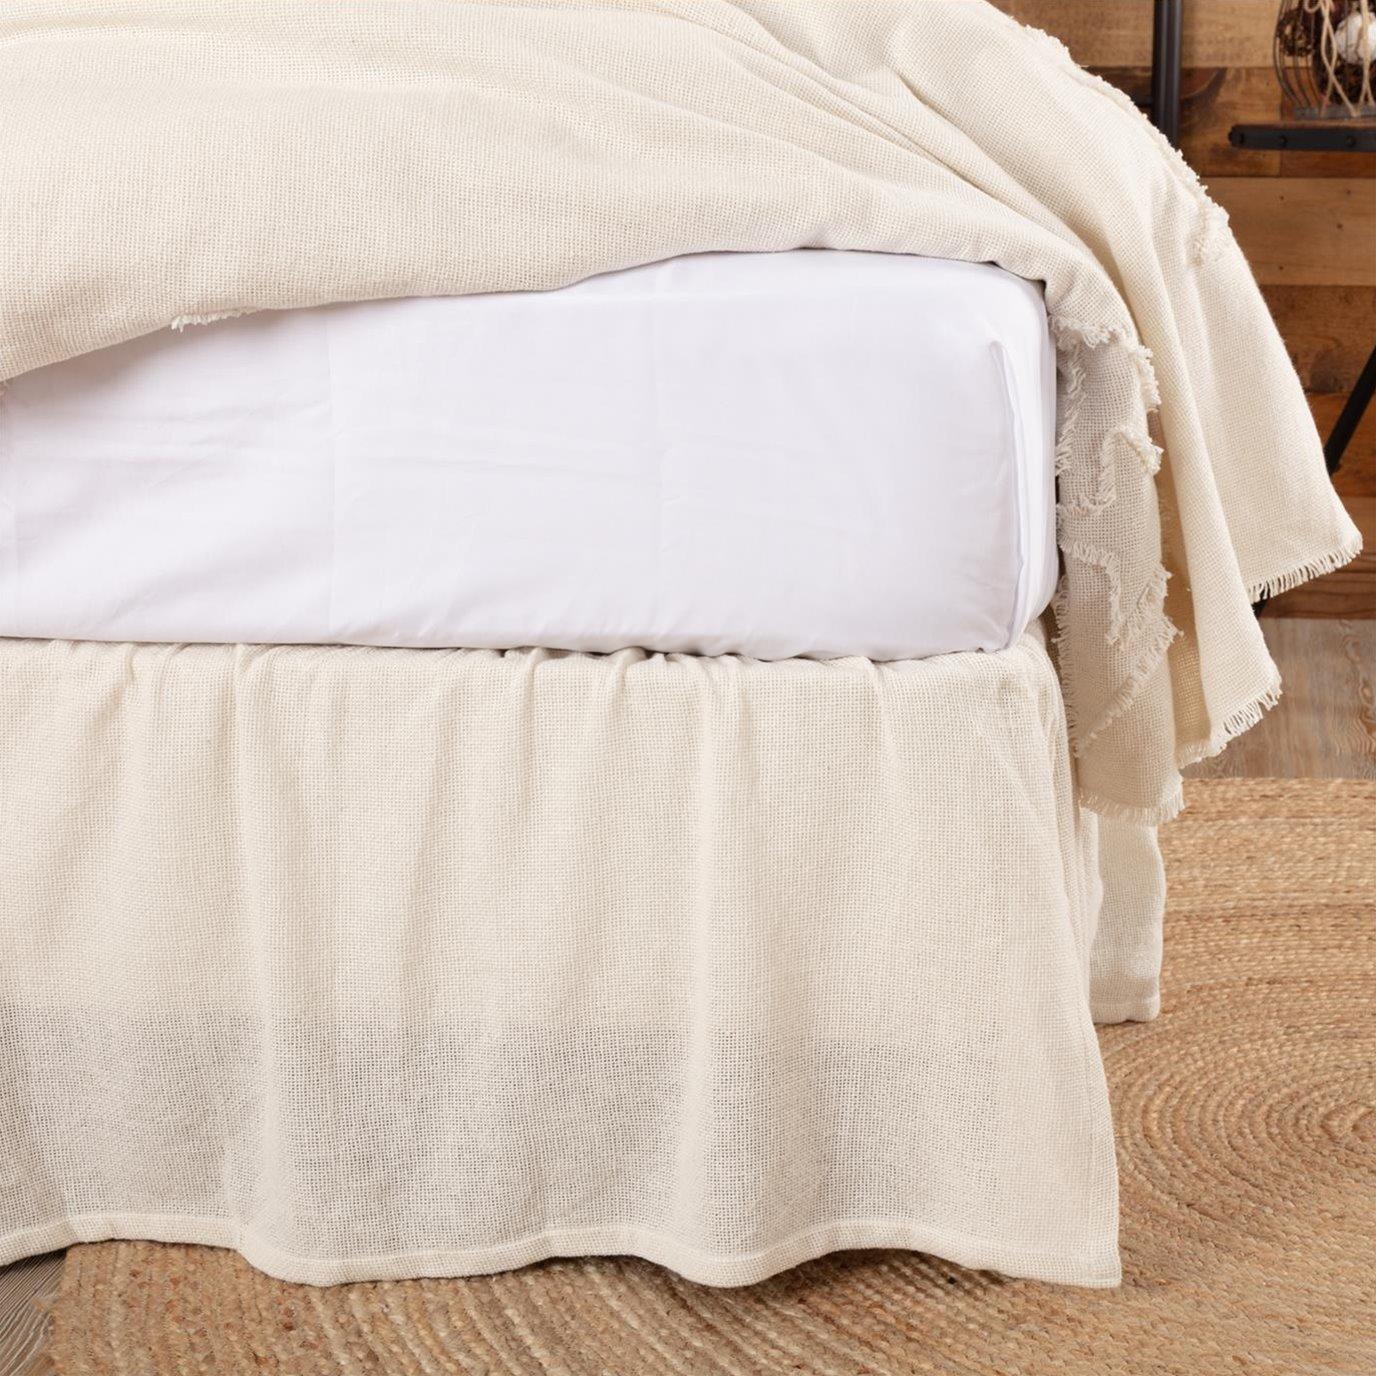 Burlap Antique White Ruffled Queen Bed Skirt 60x80x16